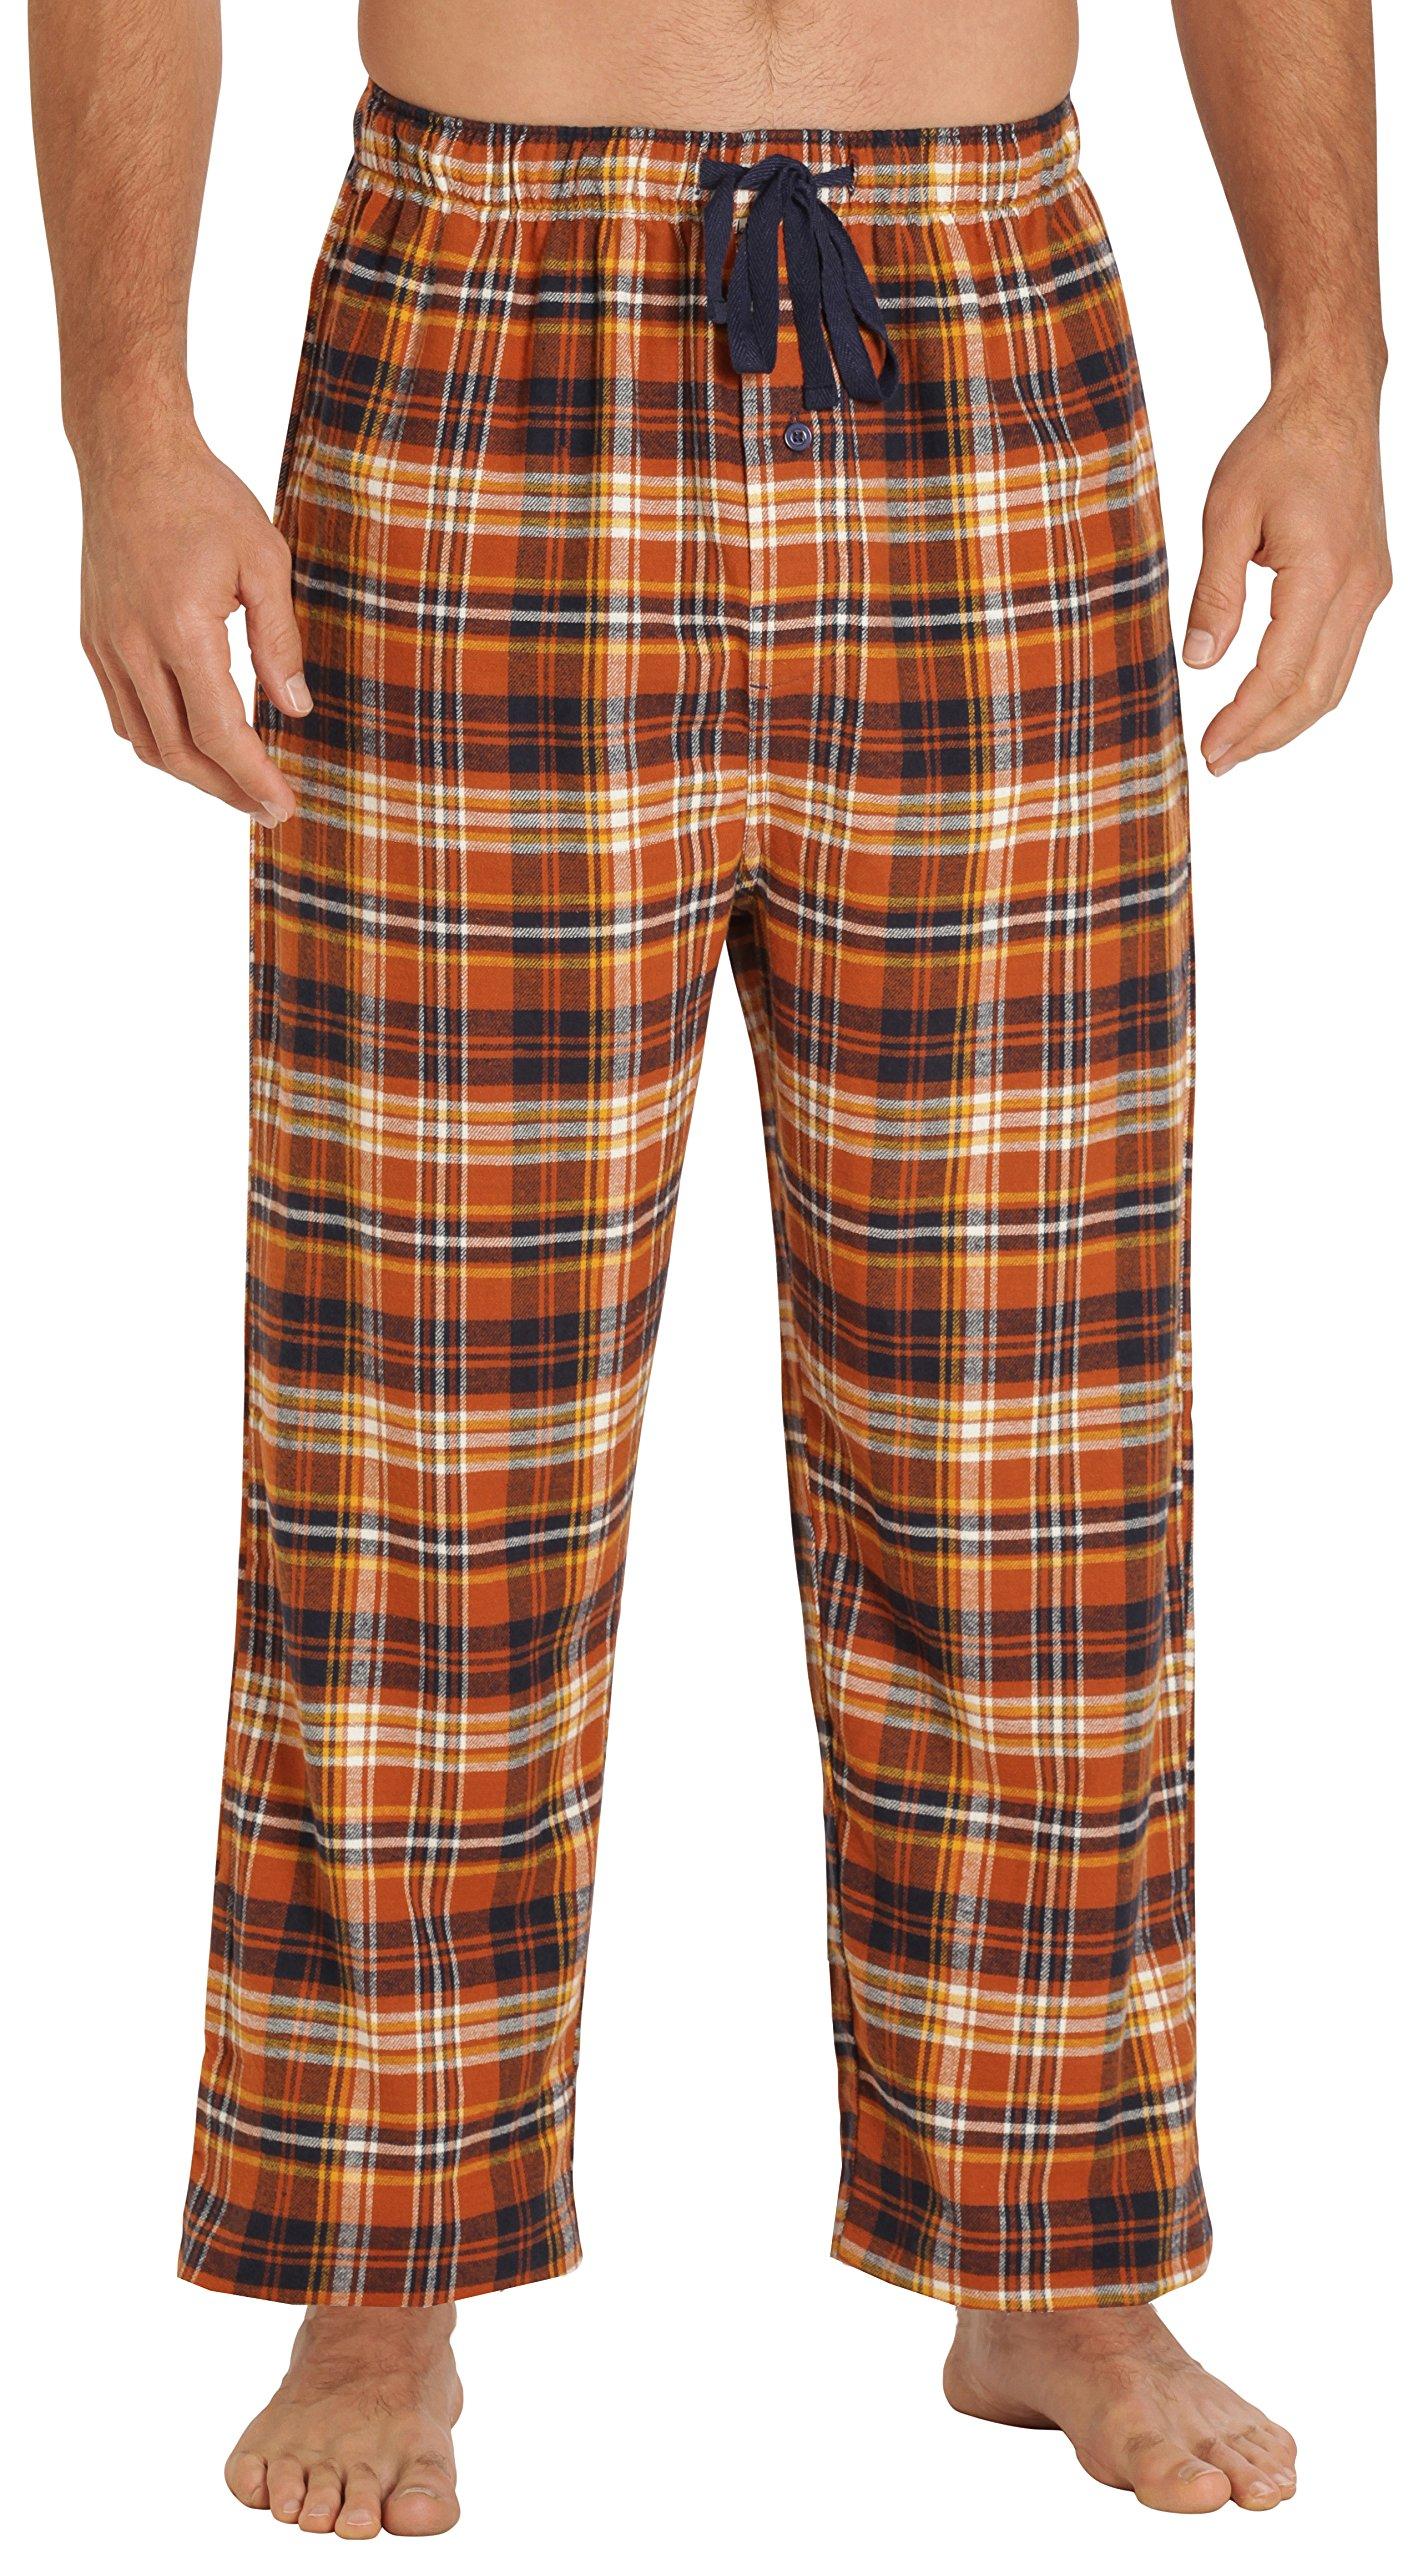 EVERDREAM Sleepwear Mens Flannel Pajama Pants, Long 100% Cotton Pj Bottoms,Size Medium Brown Rust